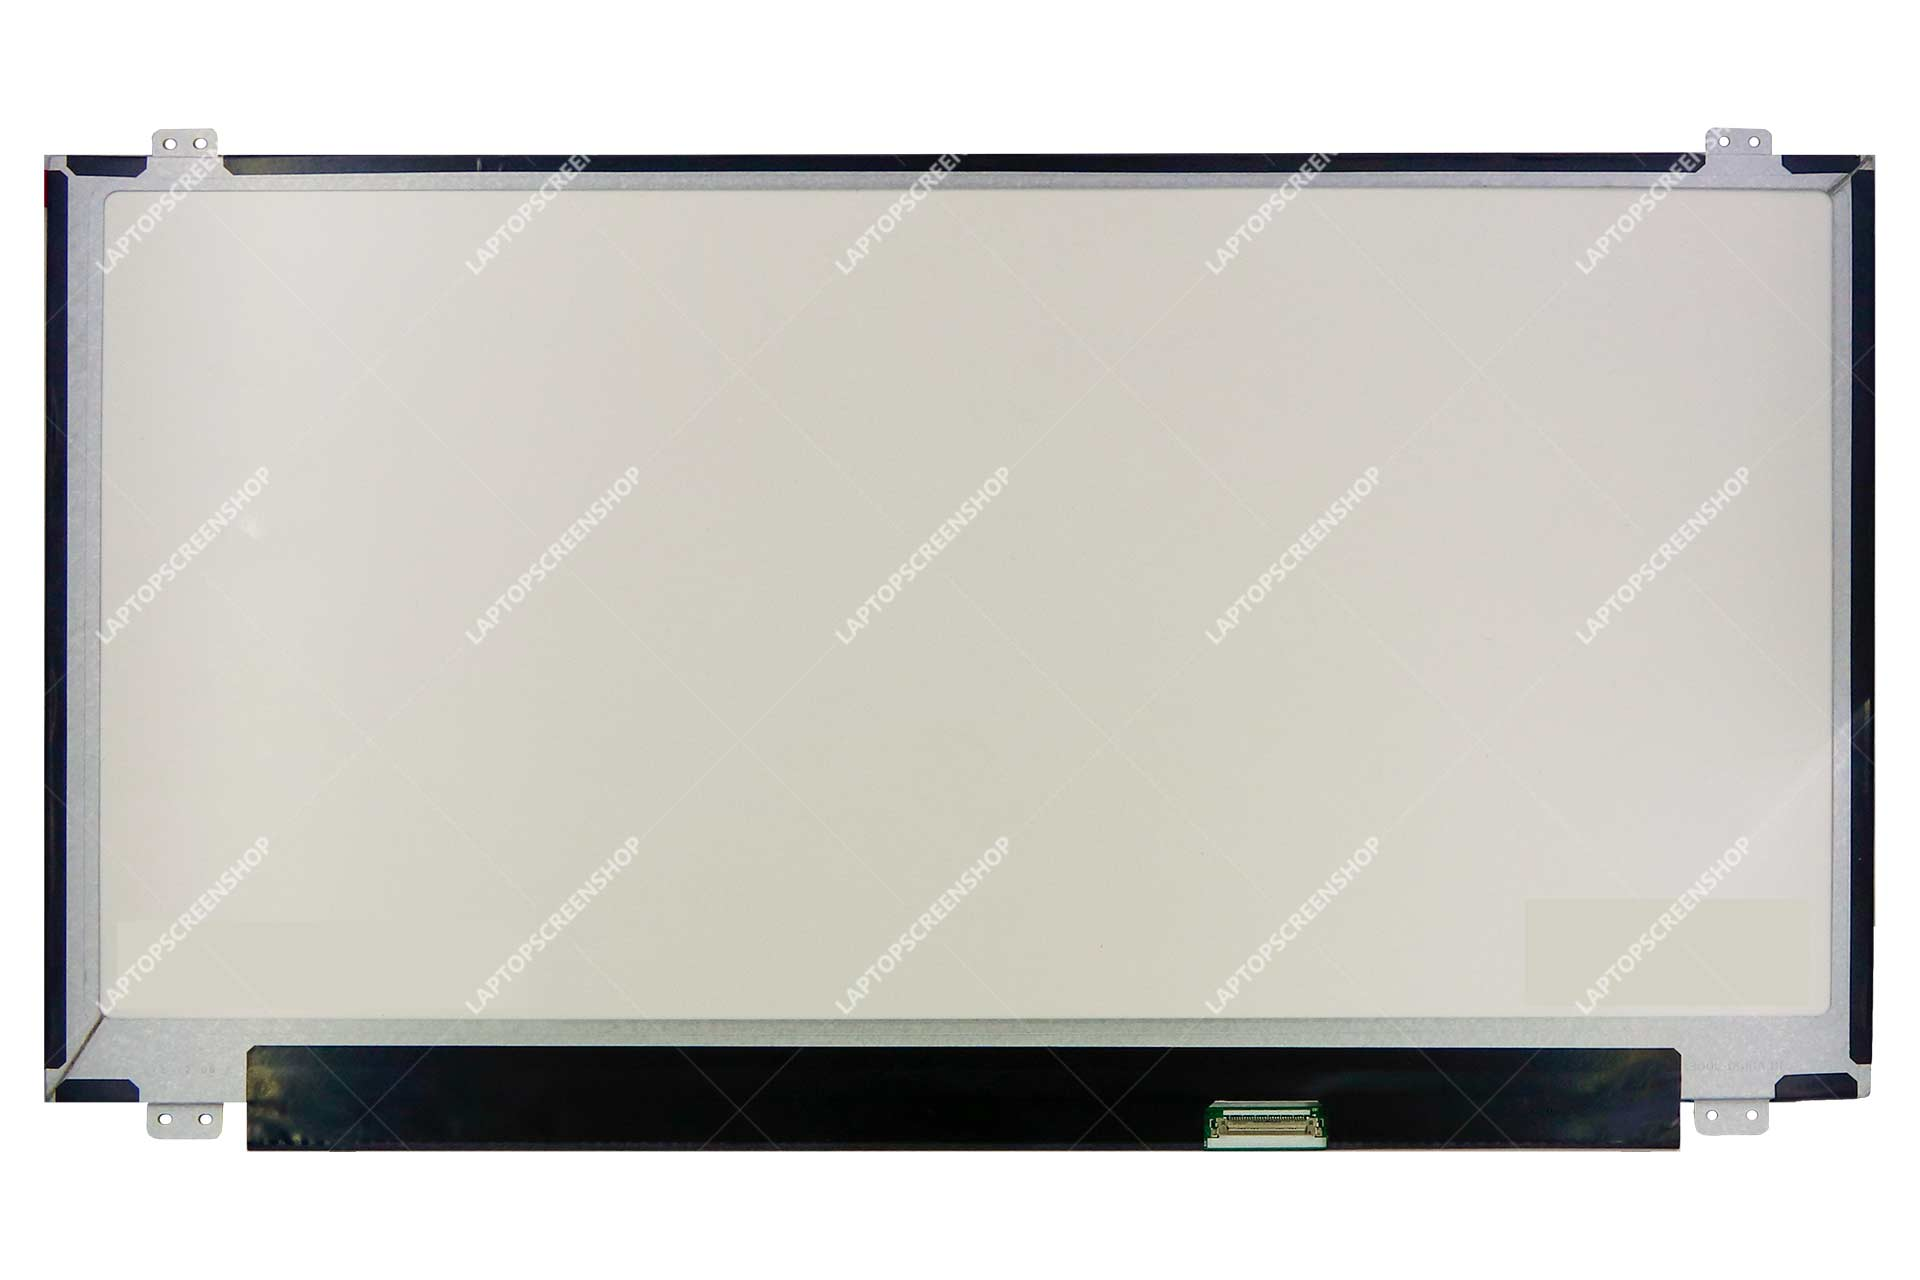 ACER-ASPIRE-E1-510-2811-LCD |HD|فروشگاه لپ تاپ اسکرين | تعمير لپ تاپ